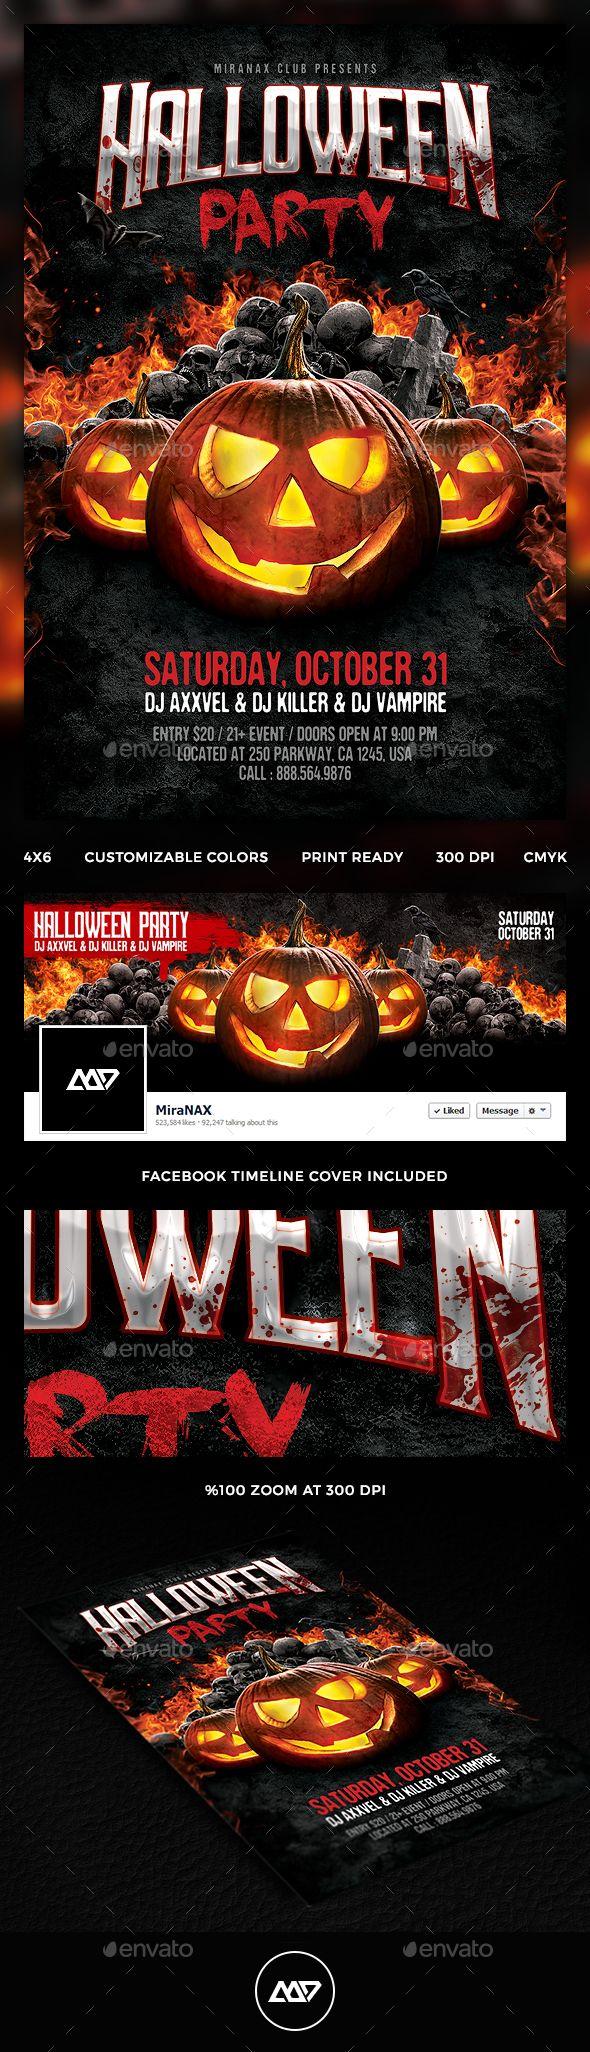 Best 25+ Halloween club ideas on Pinterest | Kindergarten ...